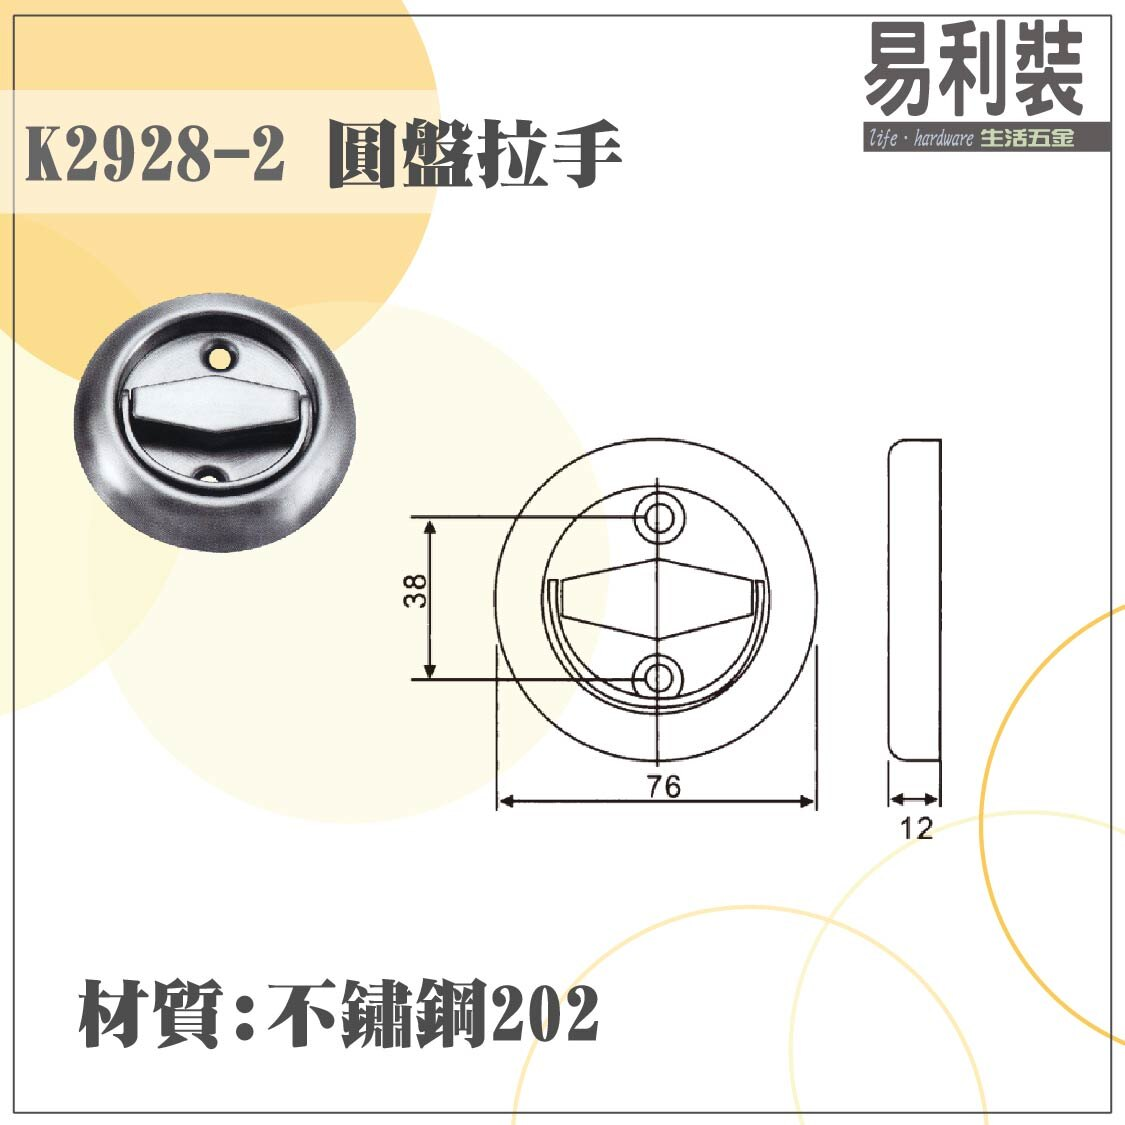 【 EASYCAN  】K2928-2 不鏽鋼圓盤拉手  易利裝生活五金 浴室 廚房 房間 臥房 衣櫃 小資族 辦公家具 系統家具 1